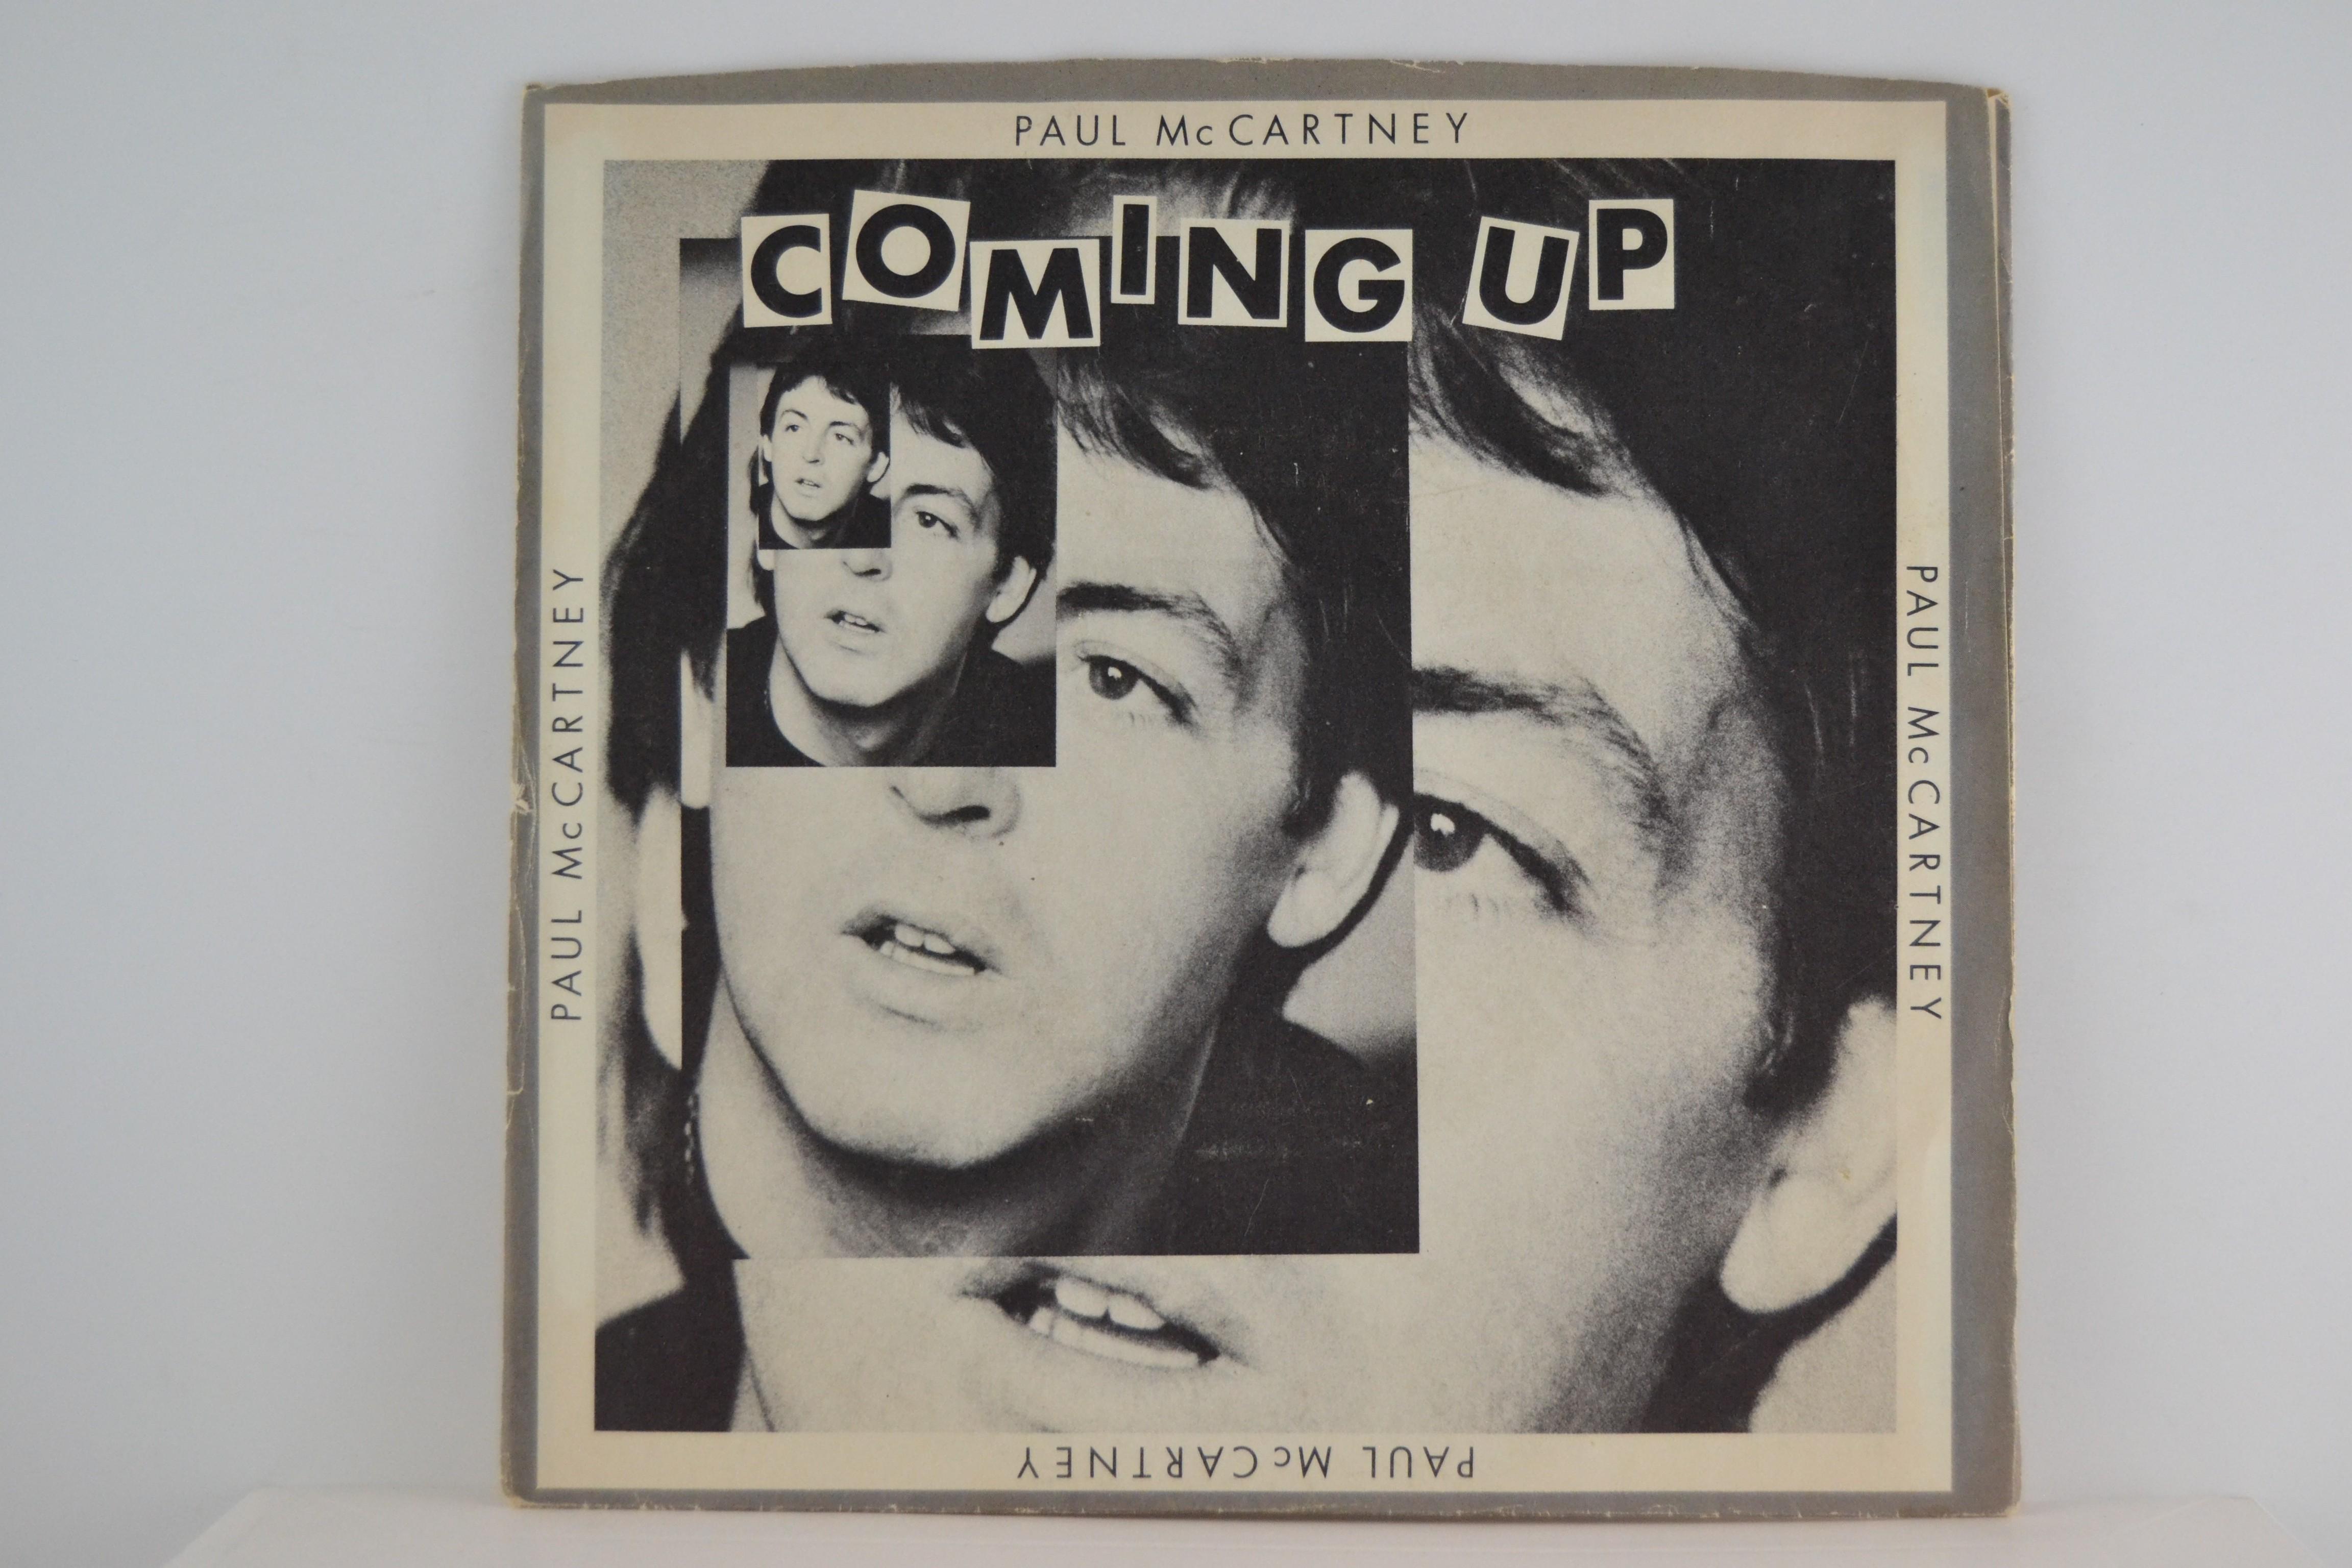 PAUL McCARTNEY : Coming up / -same (live) / Lunch box/Odd sox